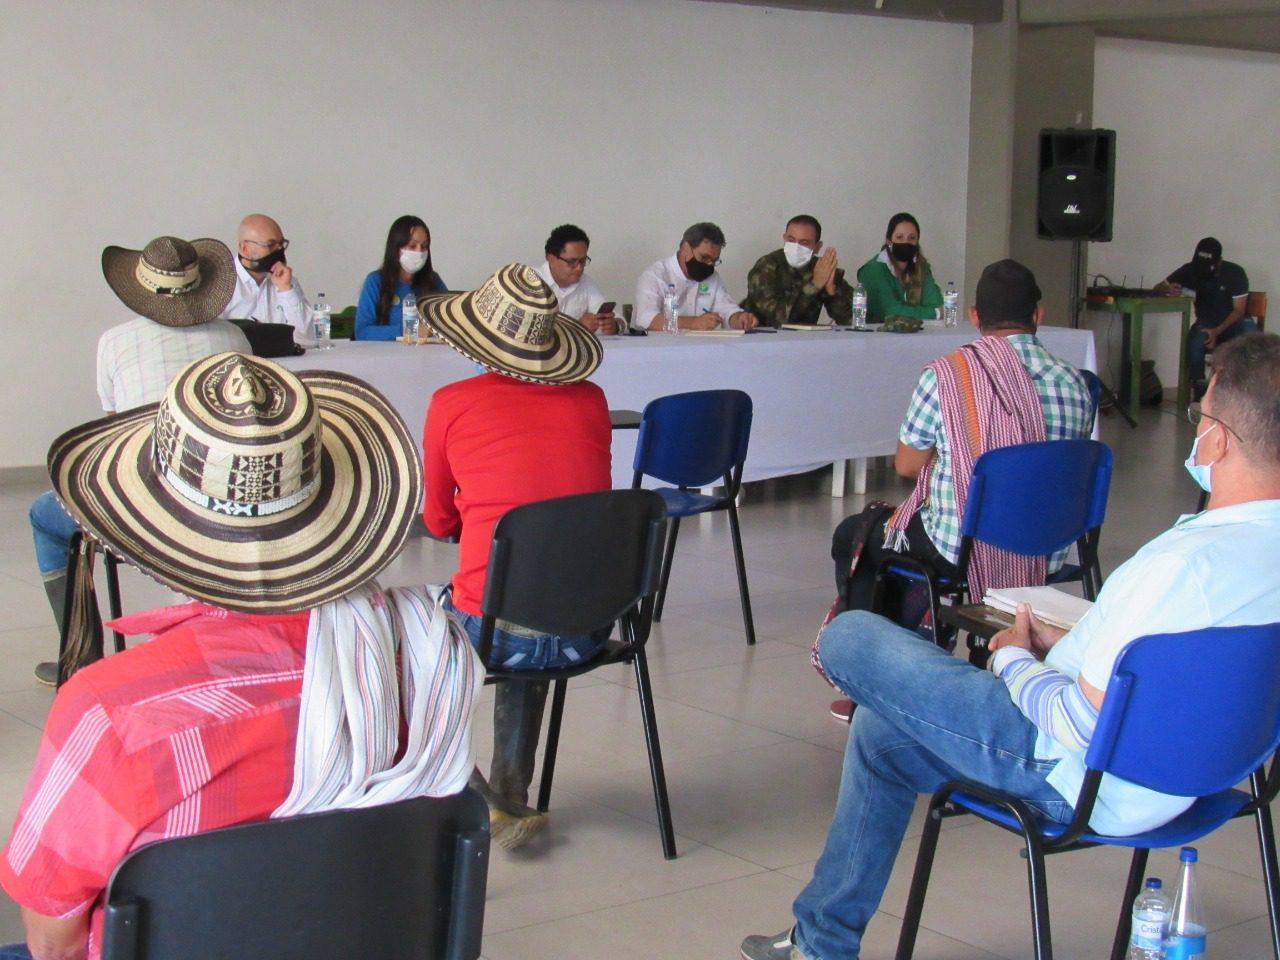 Habitantes de El Aro en Ituango (Antioquia) aprovecharán proyectos autosostenibles para erradicar cultivos ilícitos